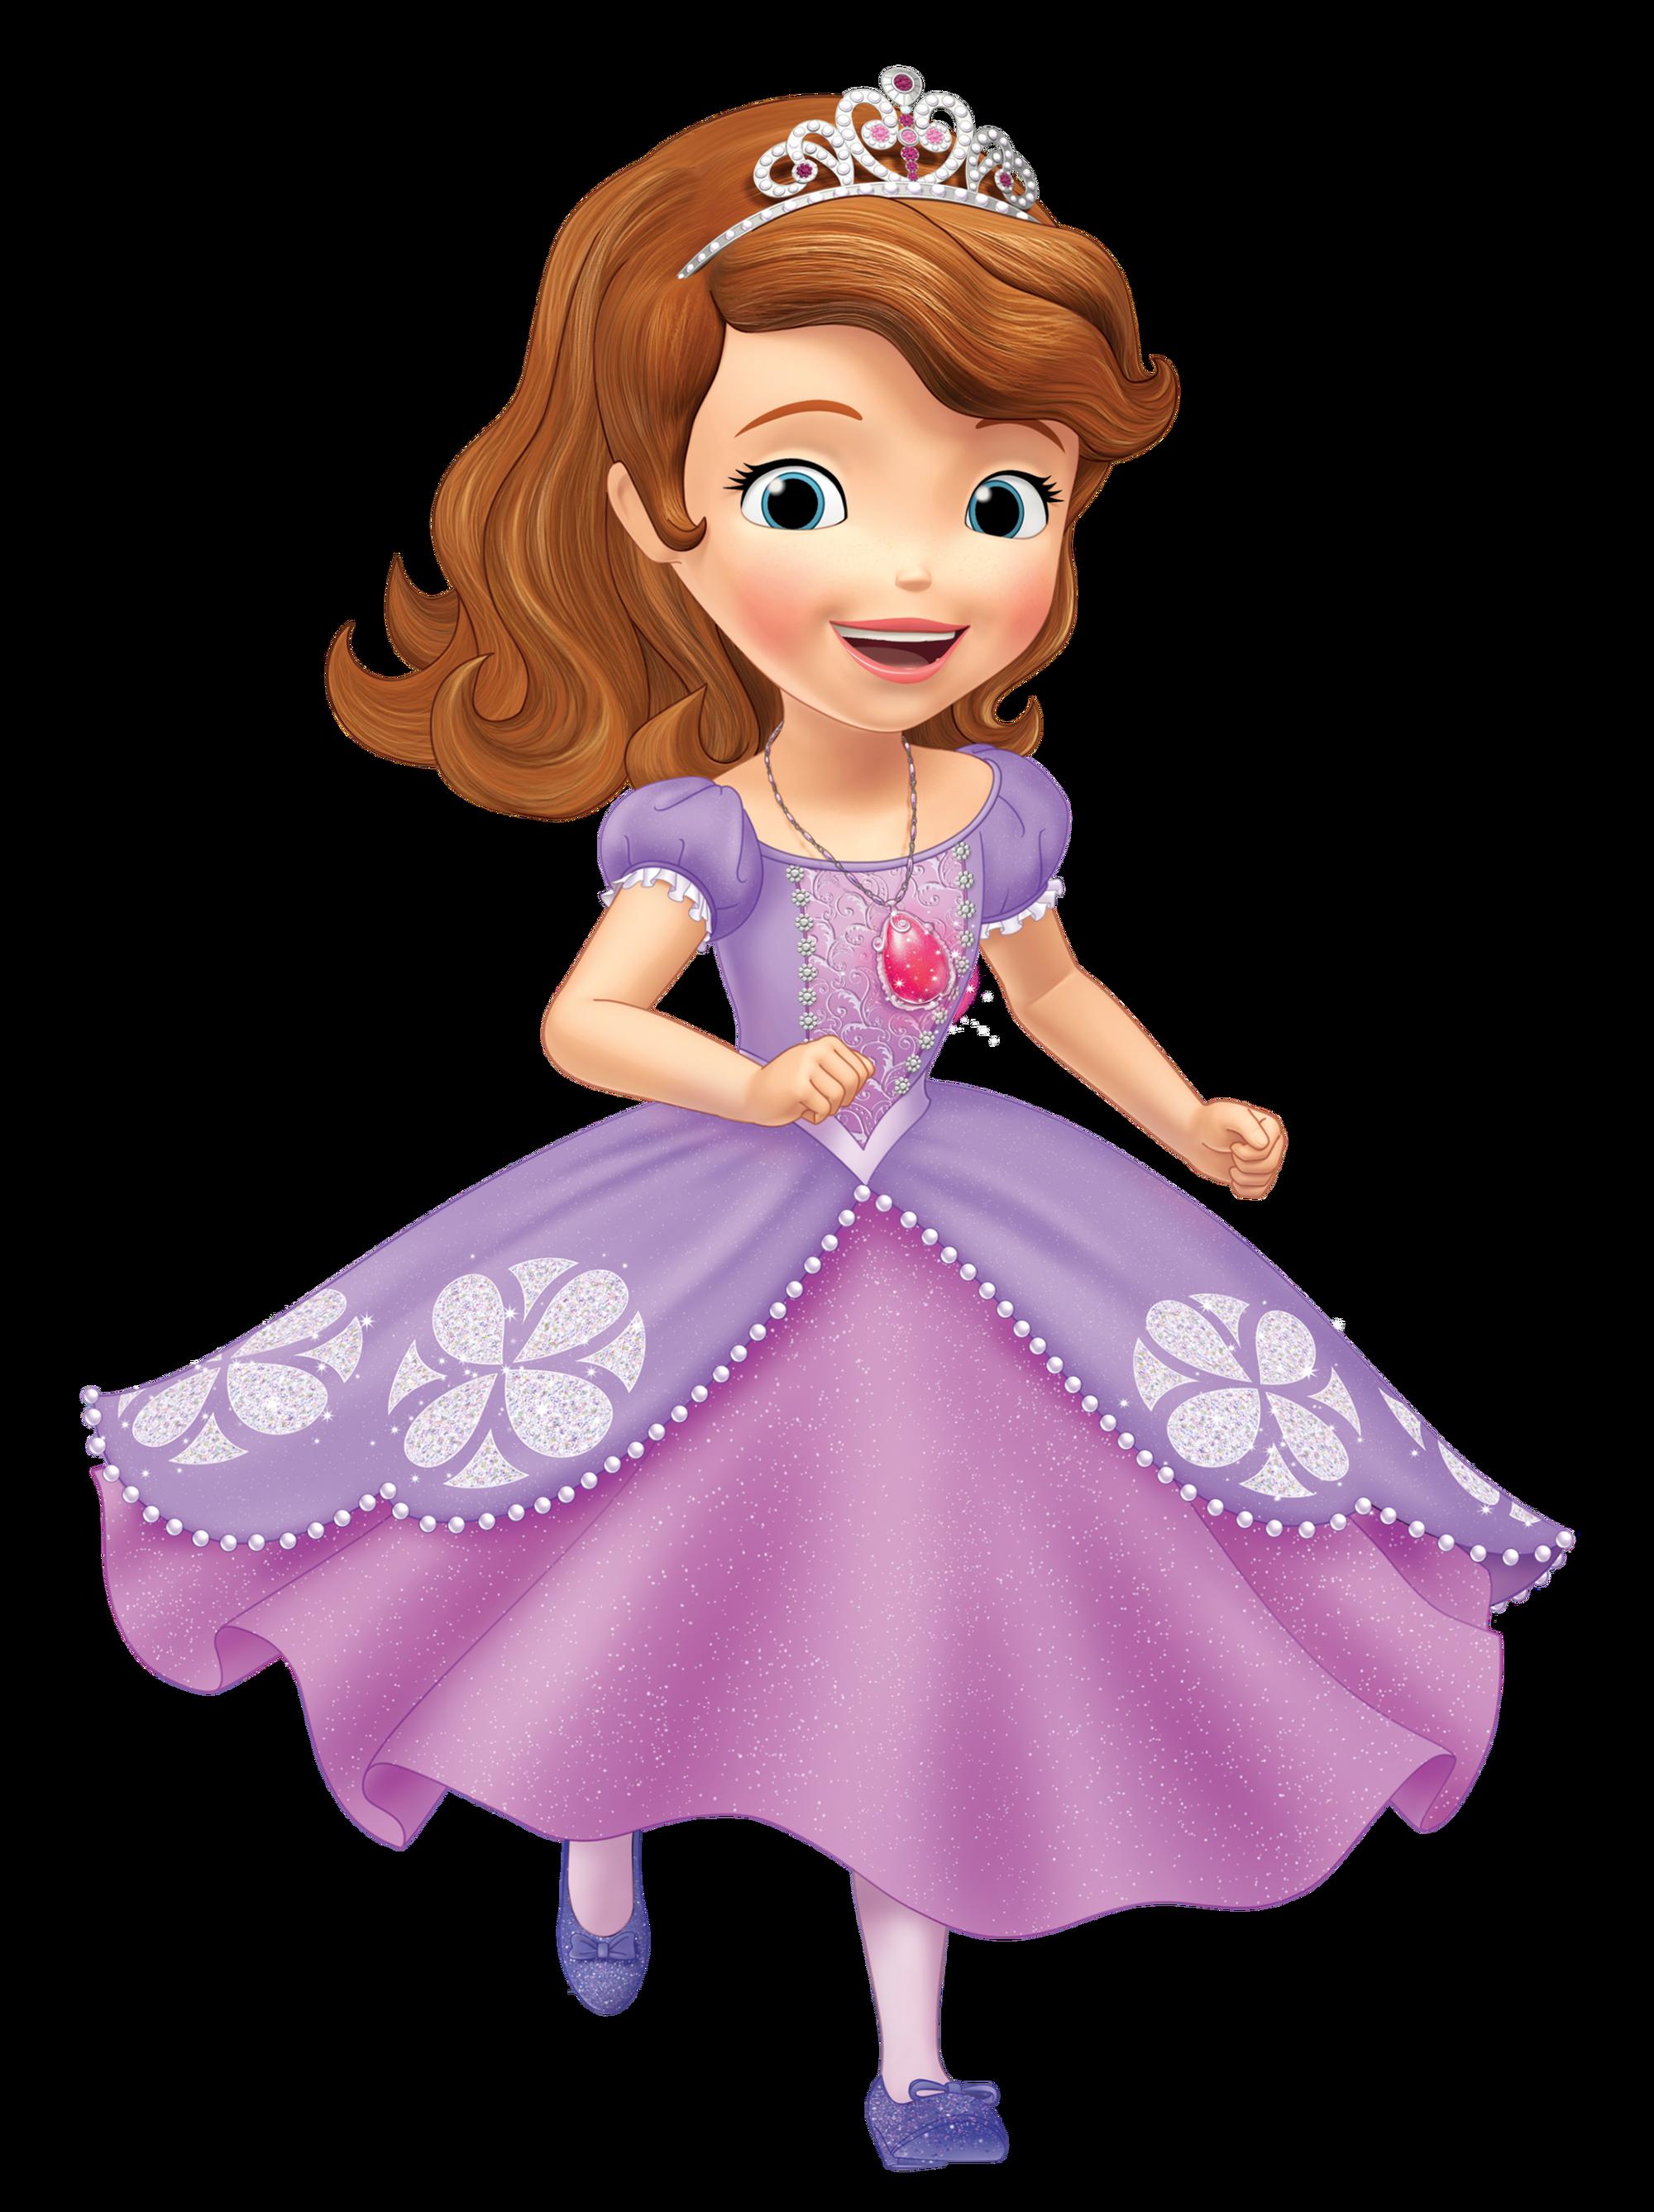 Toys Elena Sofia : Category sofia the first characters disney junior random